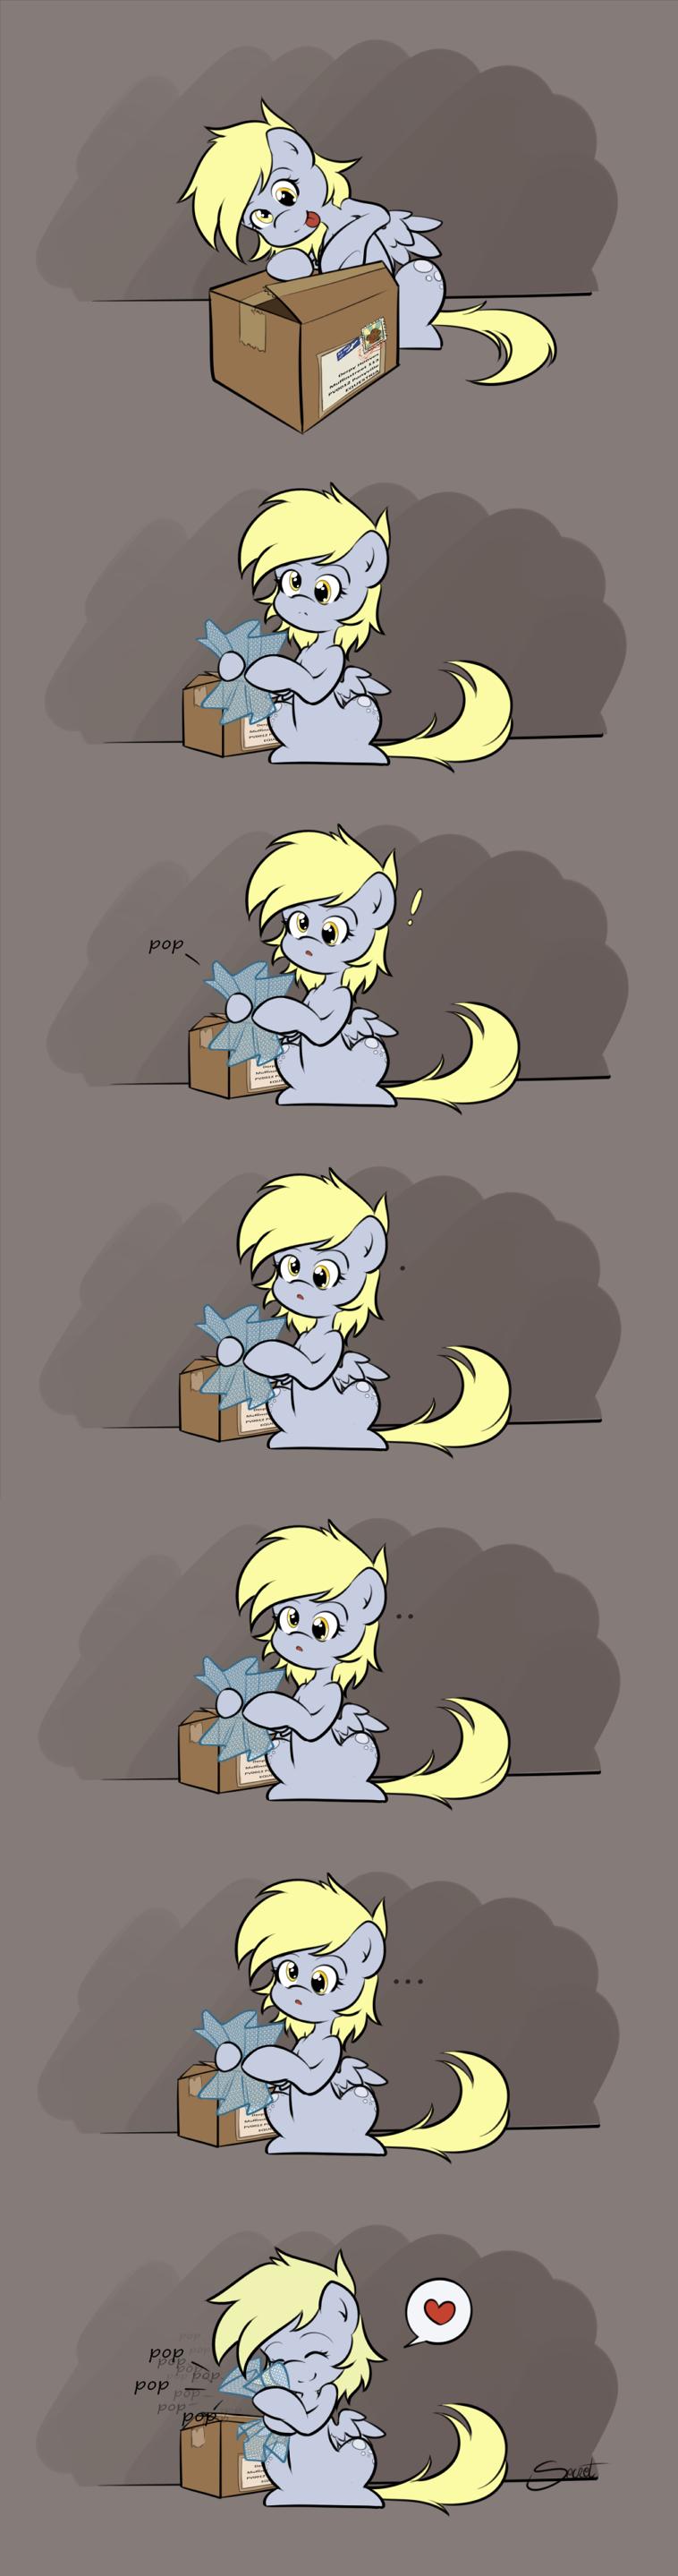 Bubblewrap by secret-pony